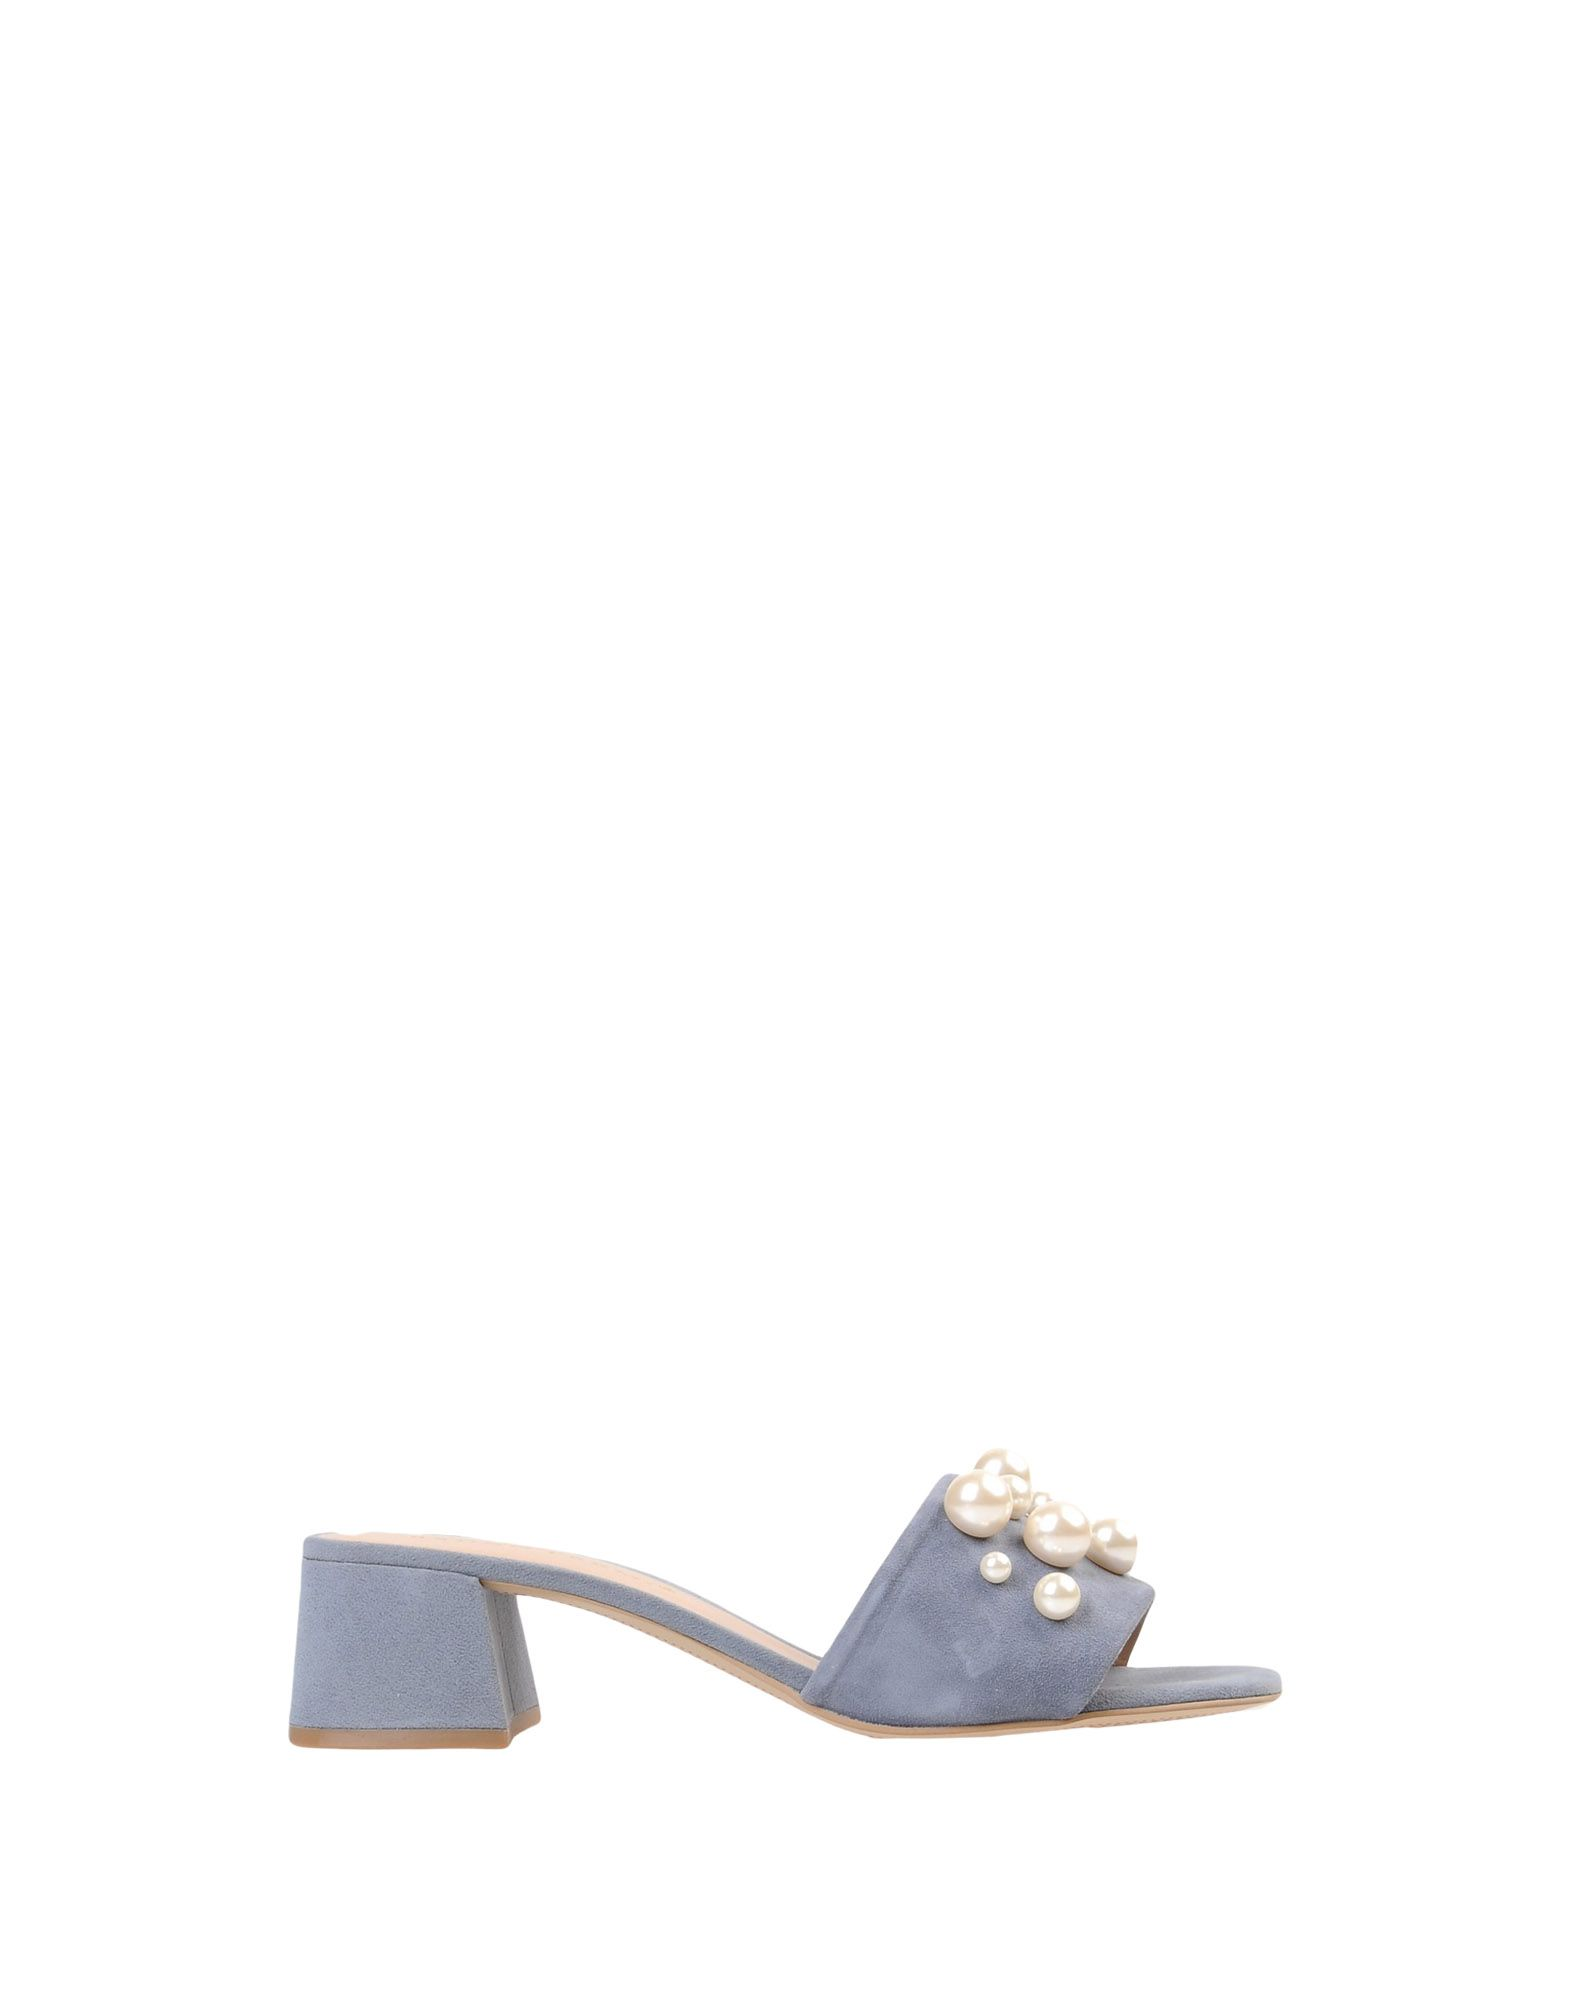 Bruno 11464567CD Premi Sandalen Damen  11464567CD Bruno Gute Qualität beliebte Schuhe e33878